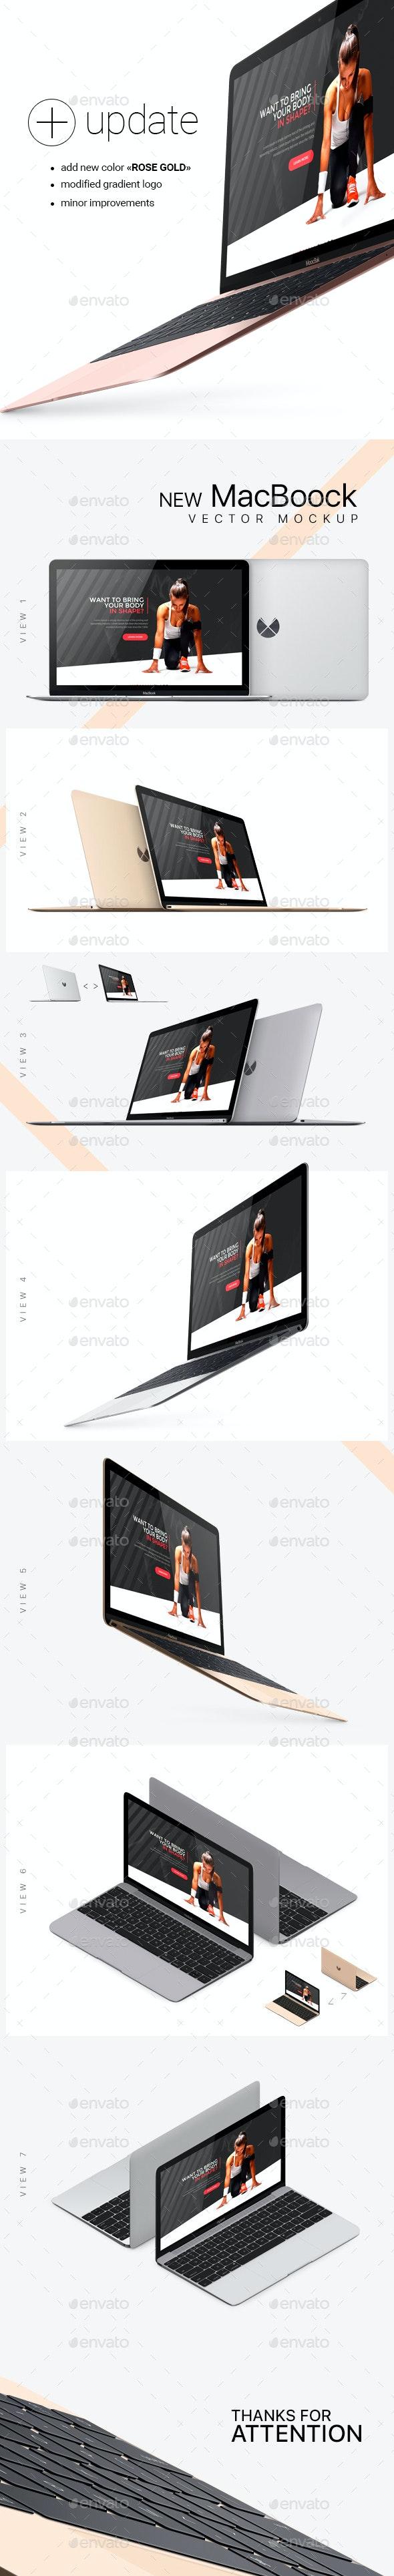 New MacBook Photorealistic Vector Mockup - Laptop Displays